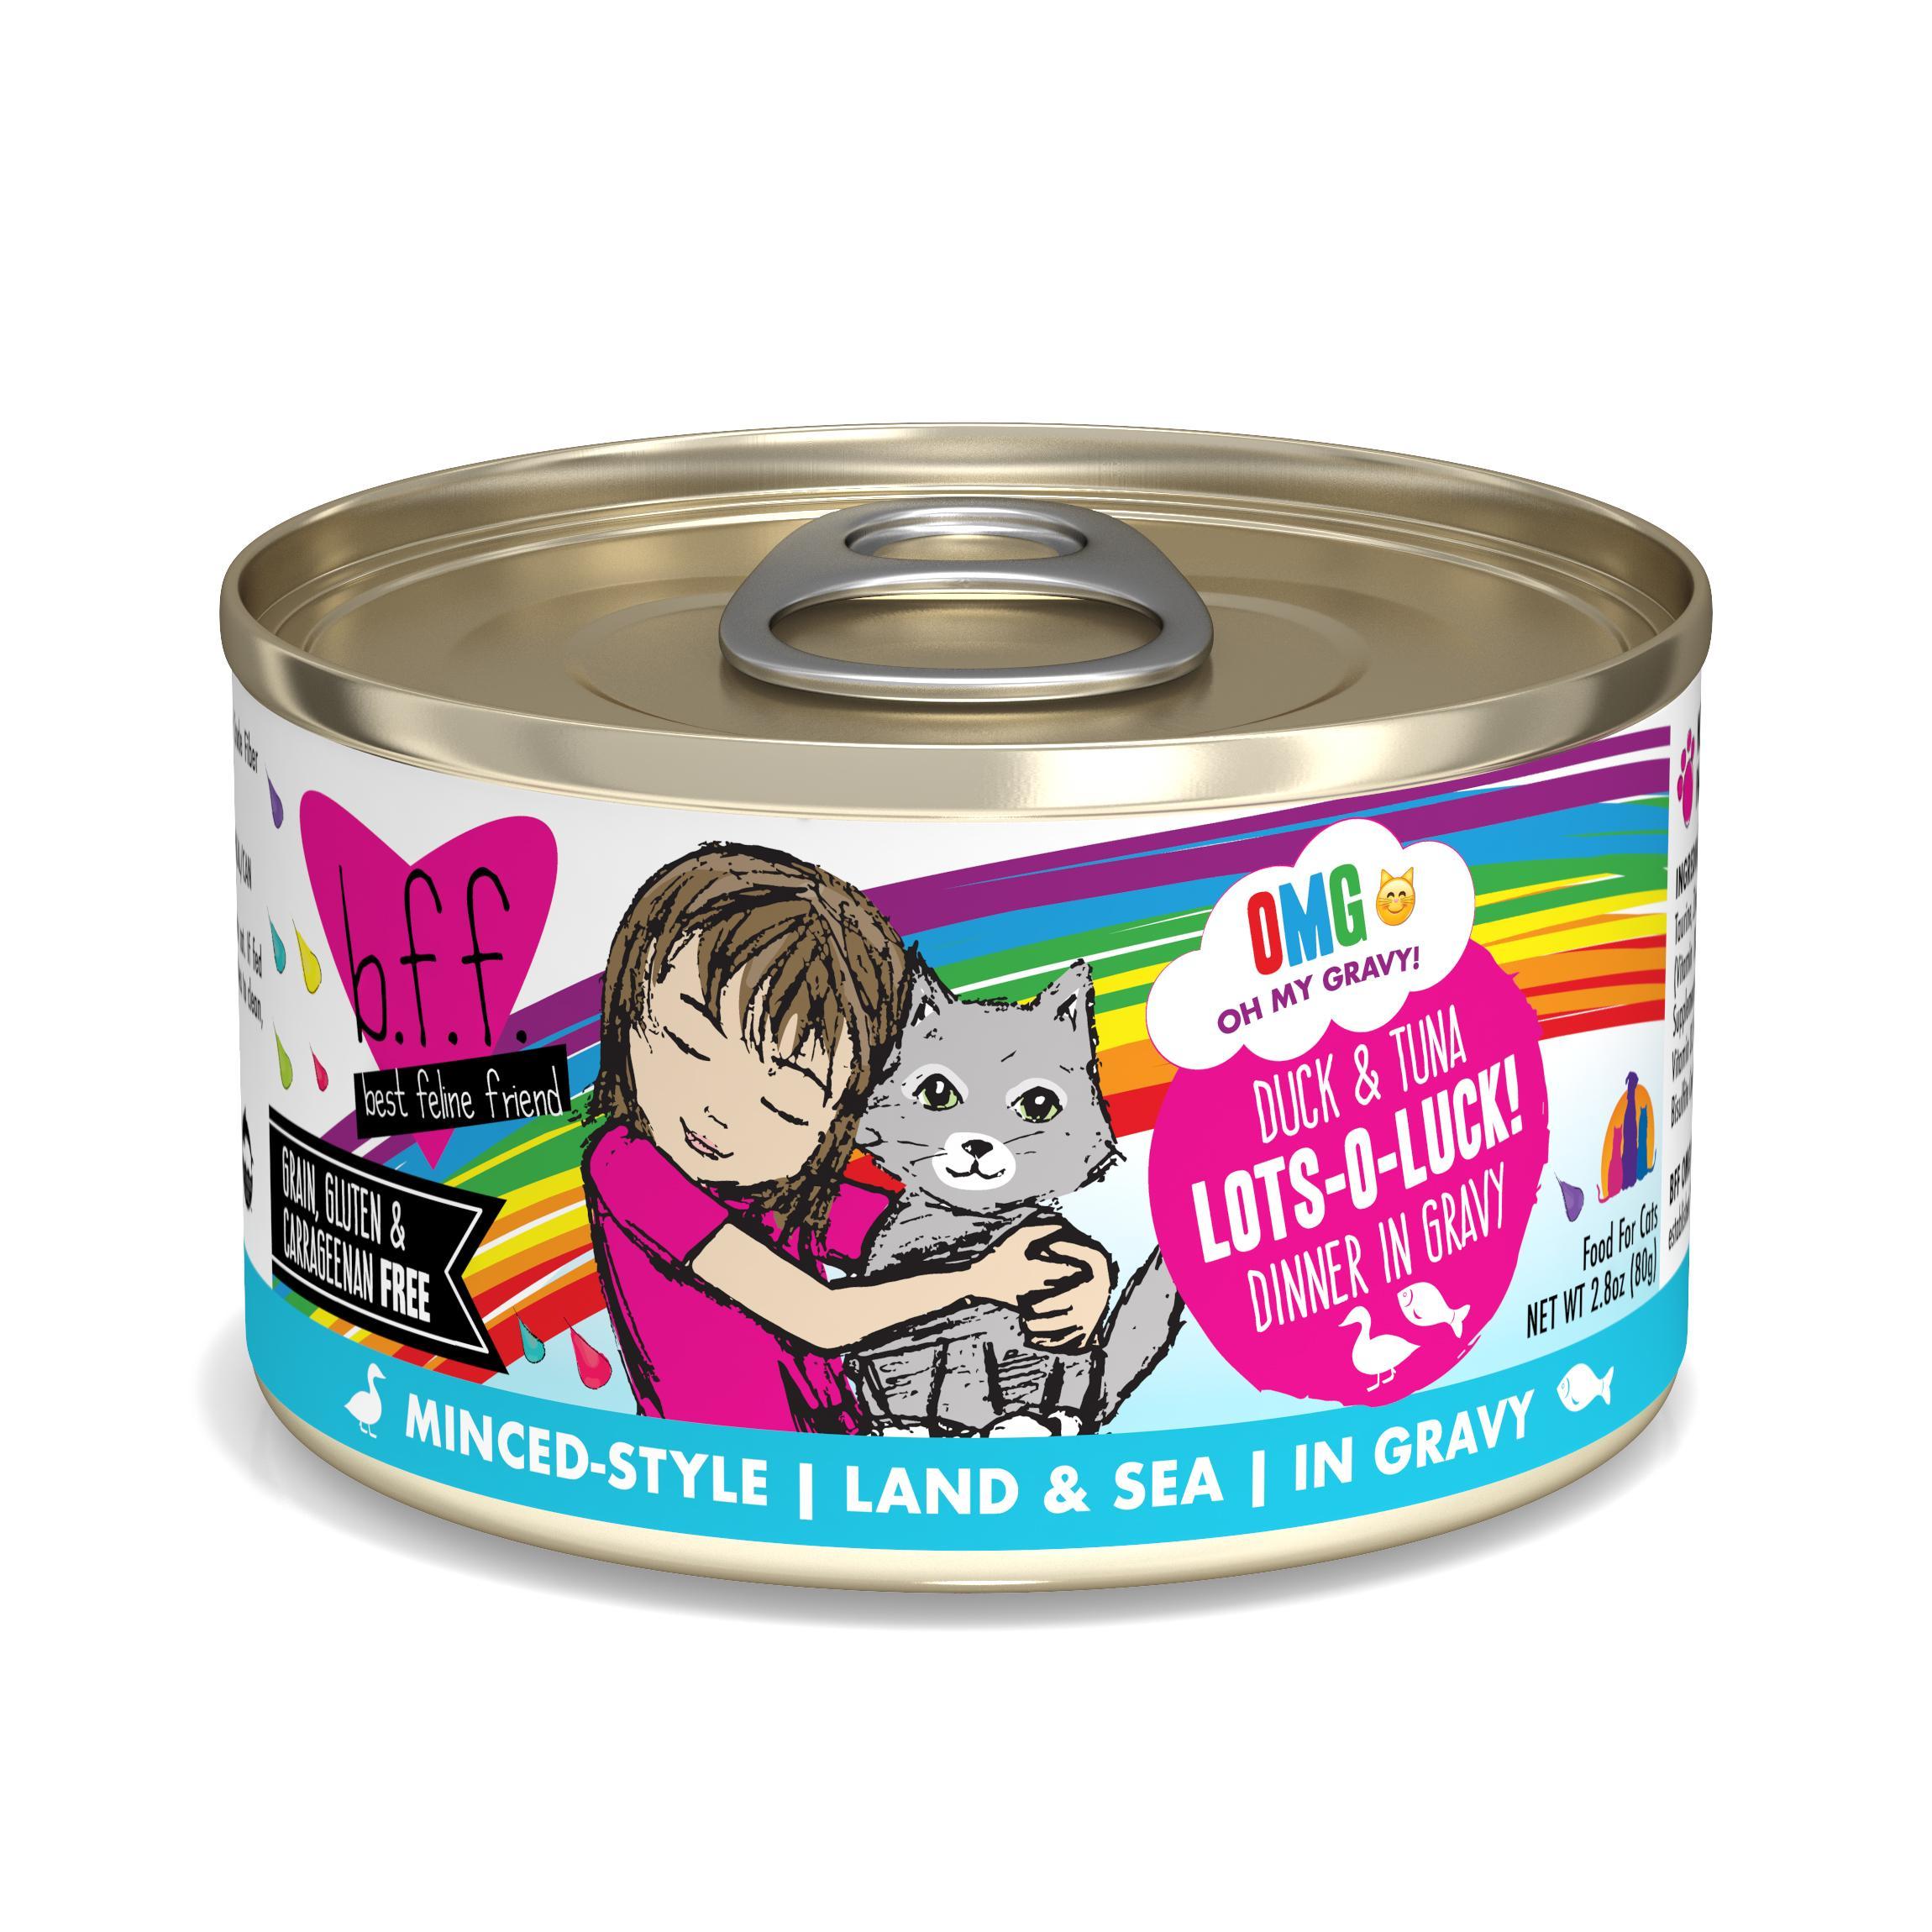 BFF Oh My Gravy! Lots-O-Luck! Duck & Tuna Dinner in Gravy Grain-Free Wet Cat Food, 2.8-oz